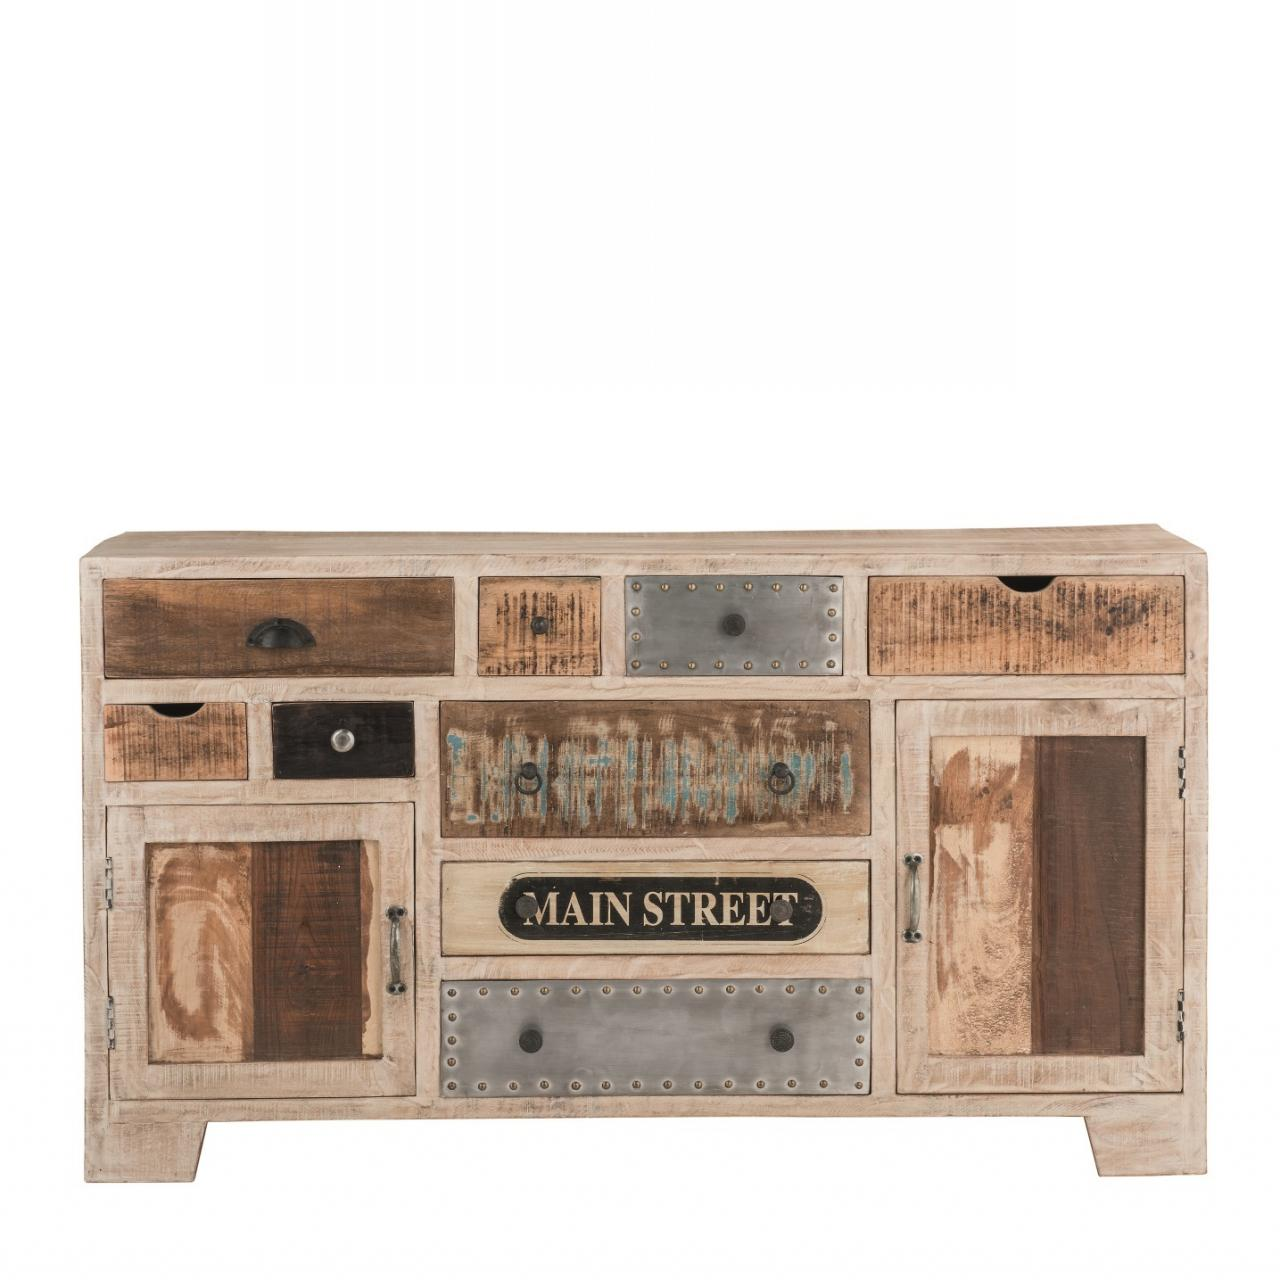 Sideboard Uma 12, Kommode, Anrichte, Schrank, Wohnzimmer, Mangoholz, 2 Türen